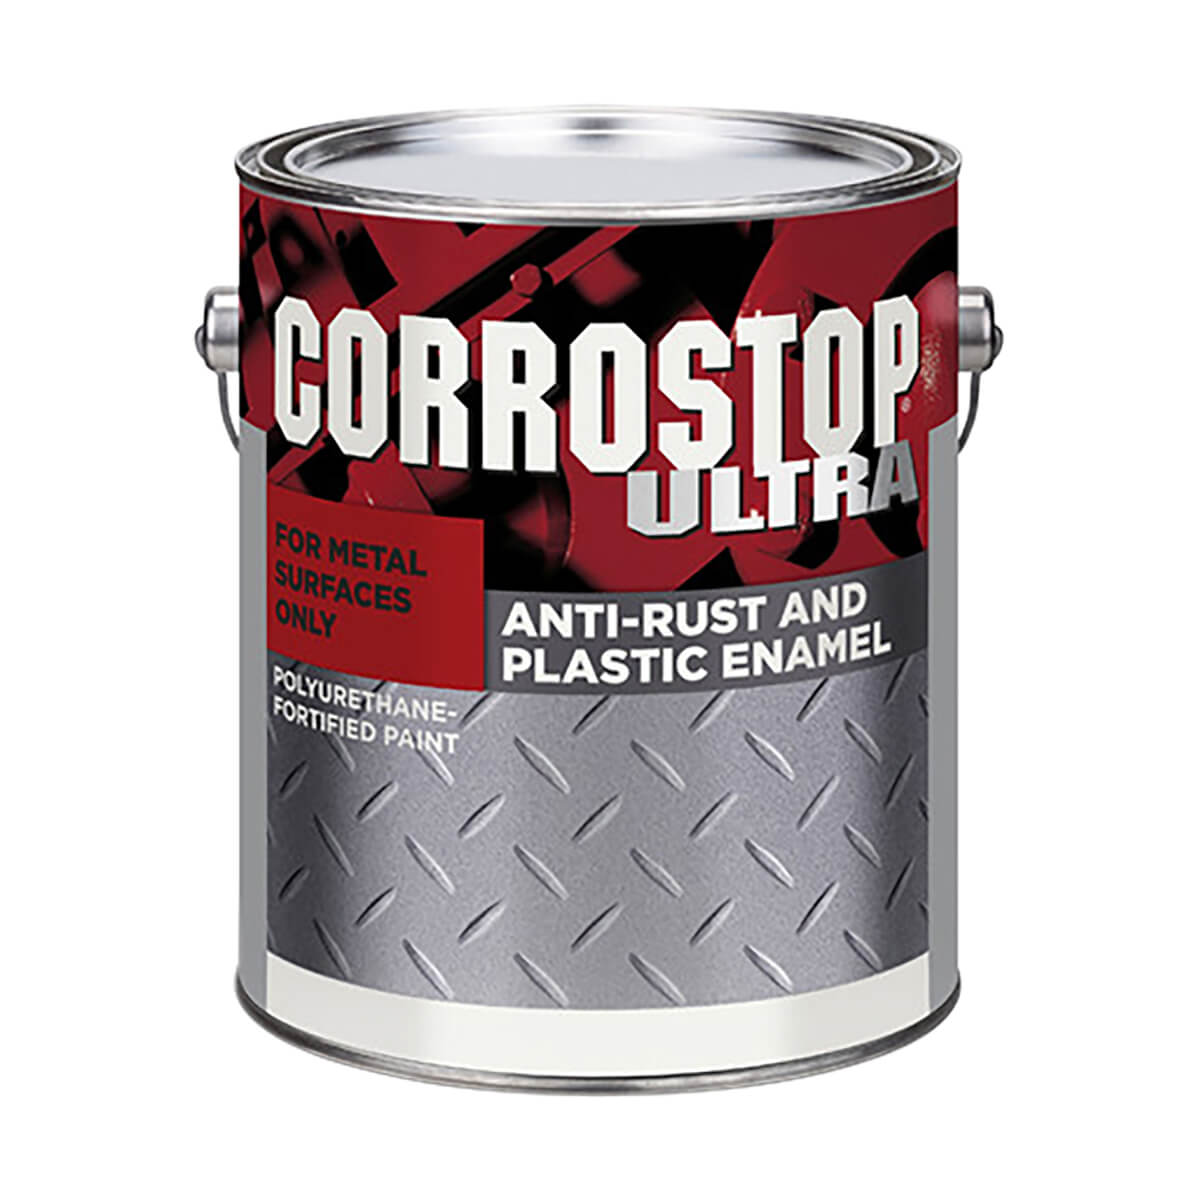 Corrostop - Anti-rust Alkyd Paint - Flat White - 3.78 L